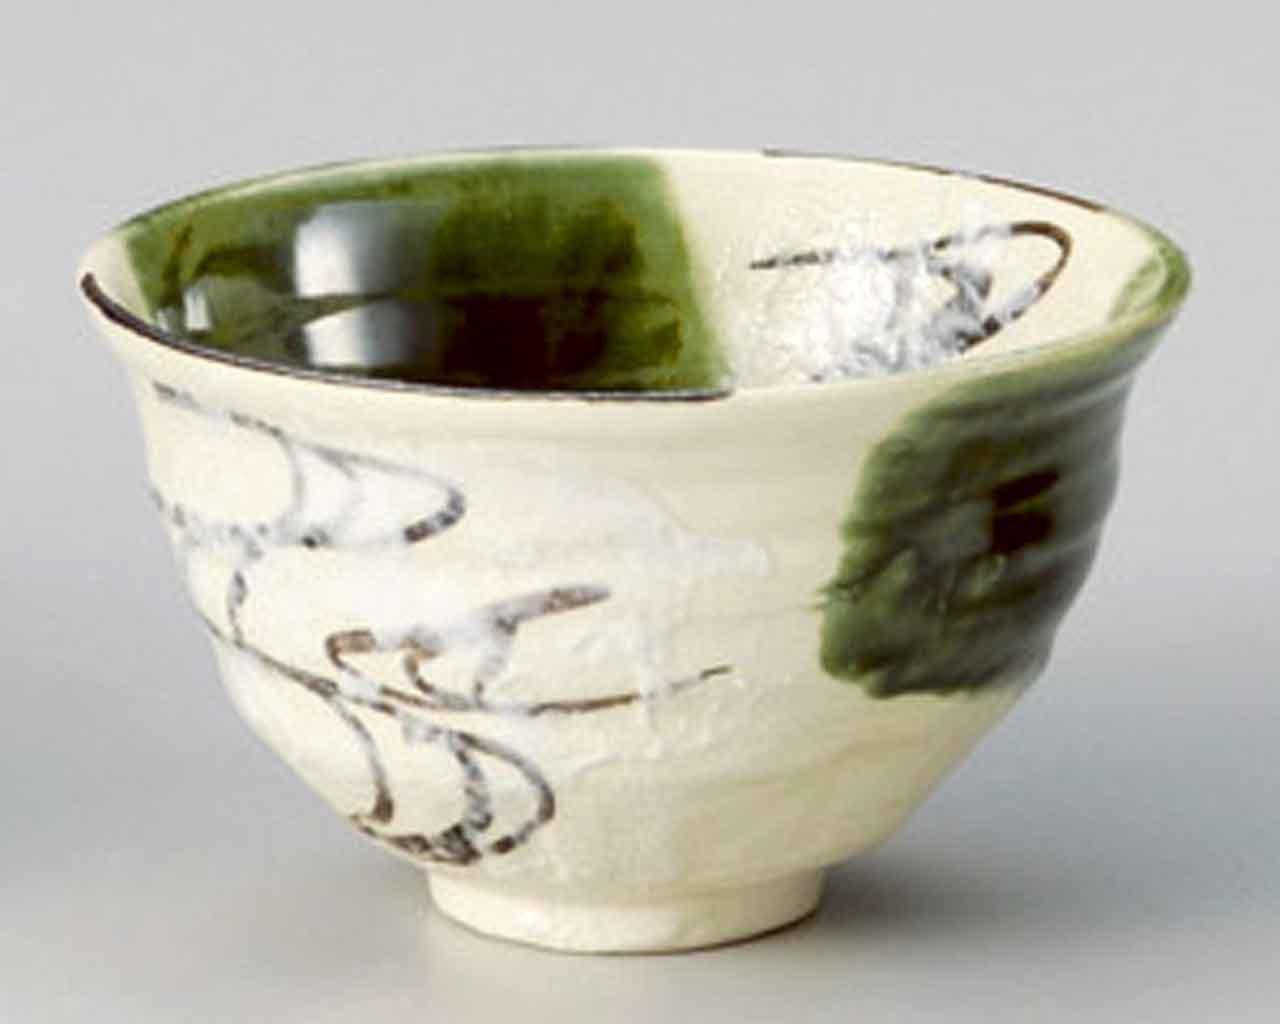 Oribe Ryusui 5.9inch Set of 5 Ramen-Bowls Beige Ceramic Made in Japan